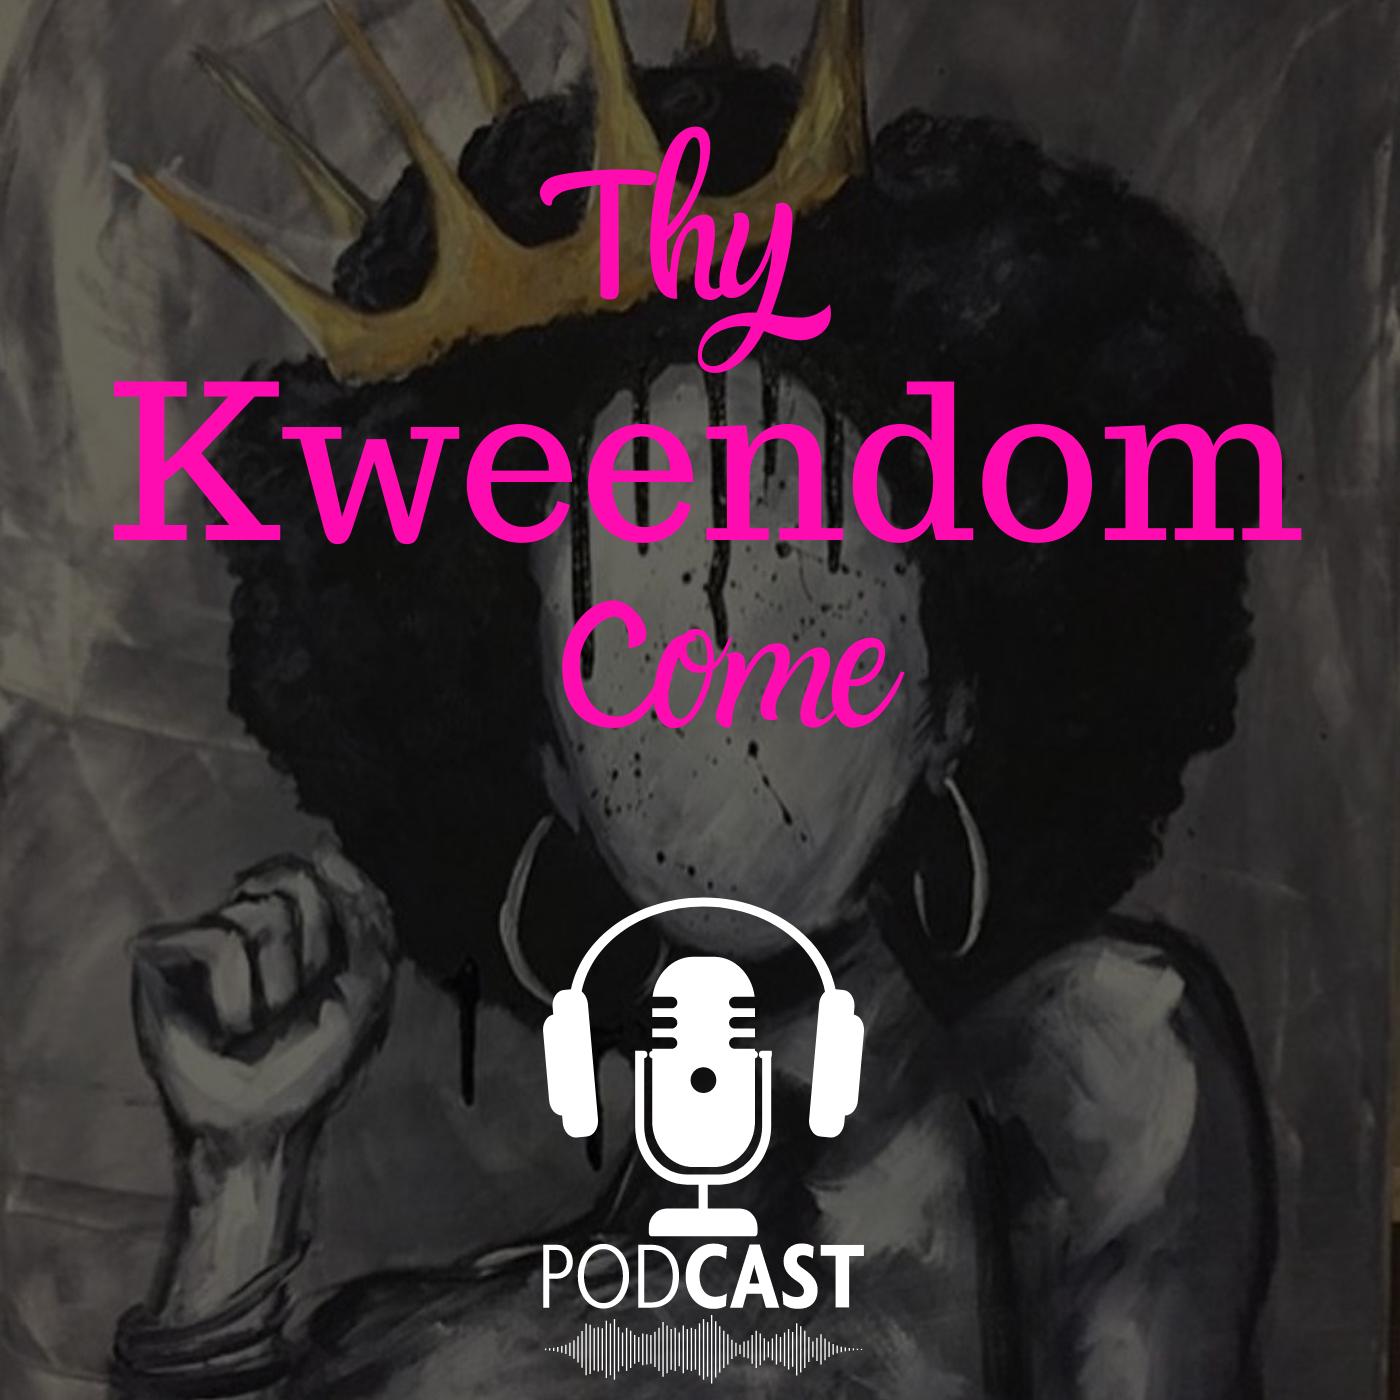 Thy Kweendom Come Podcast Interview